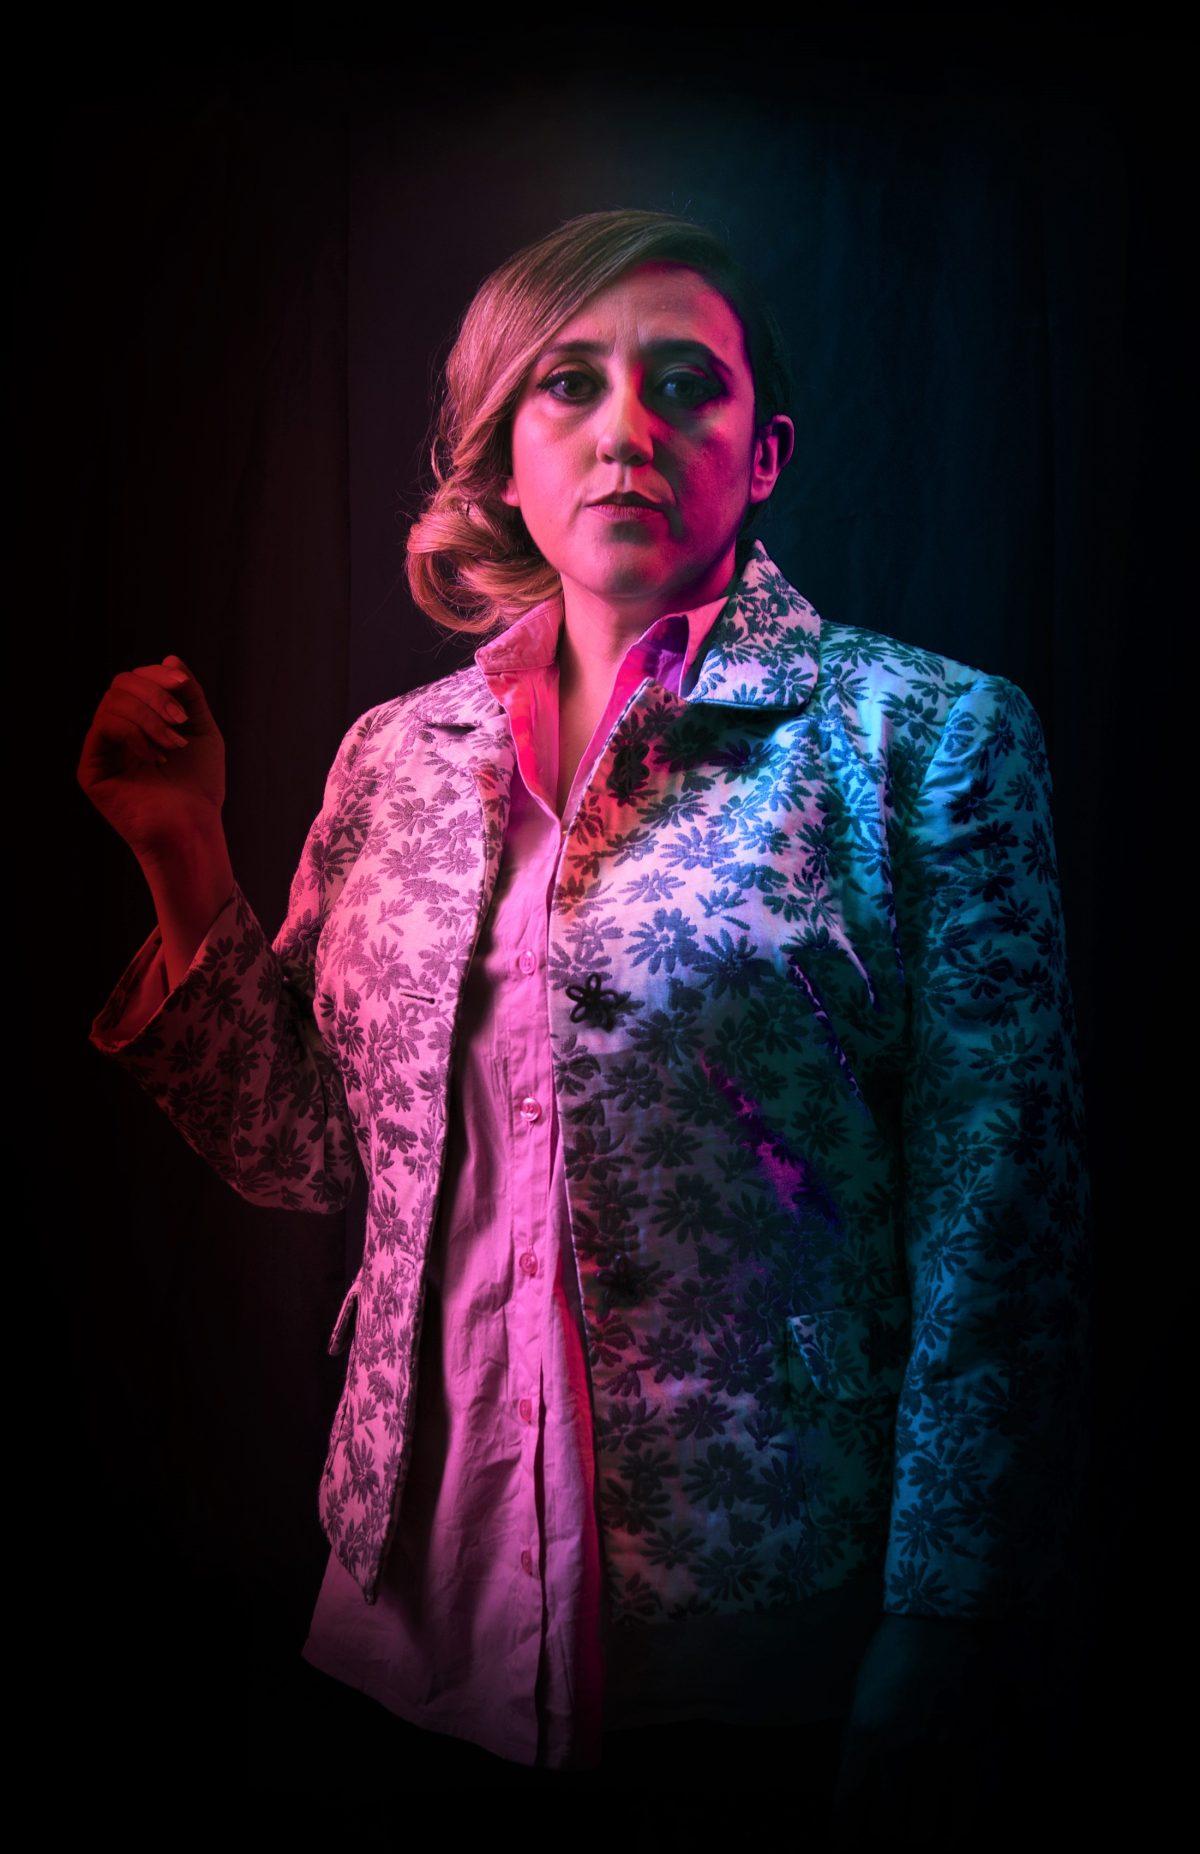 Teatro: Juegos Asesinos